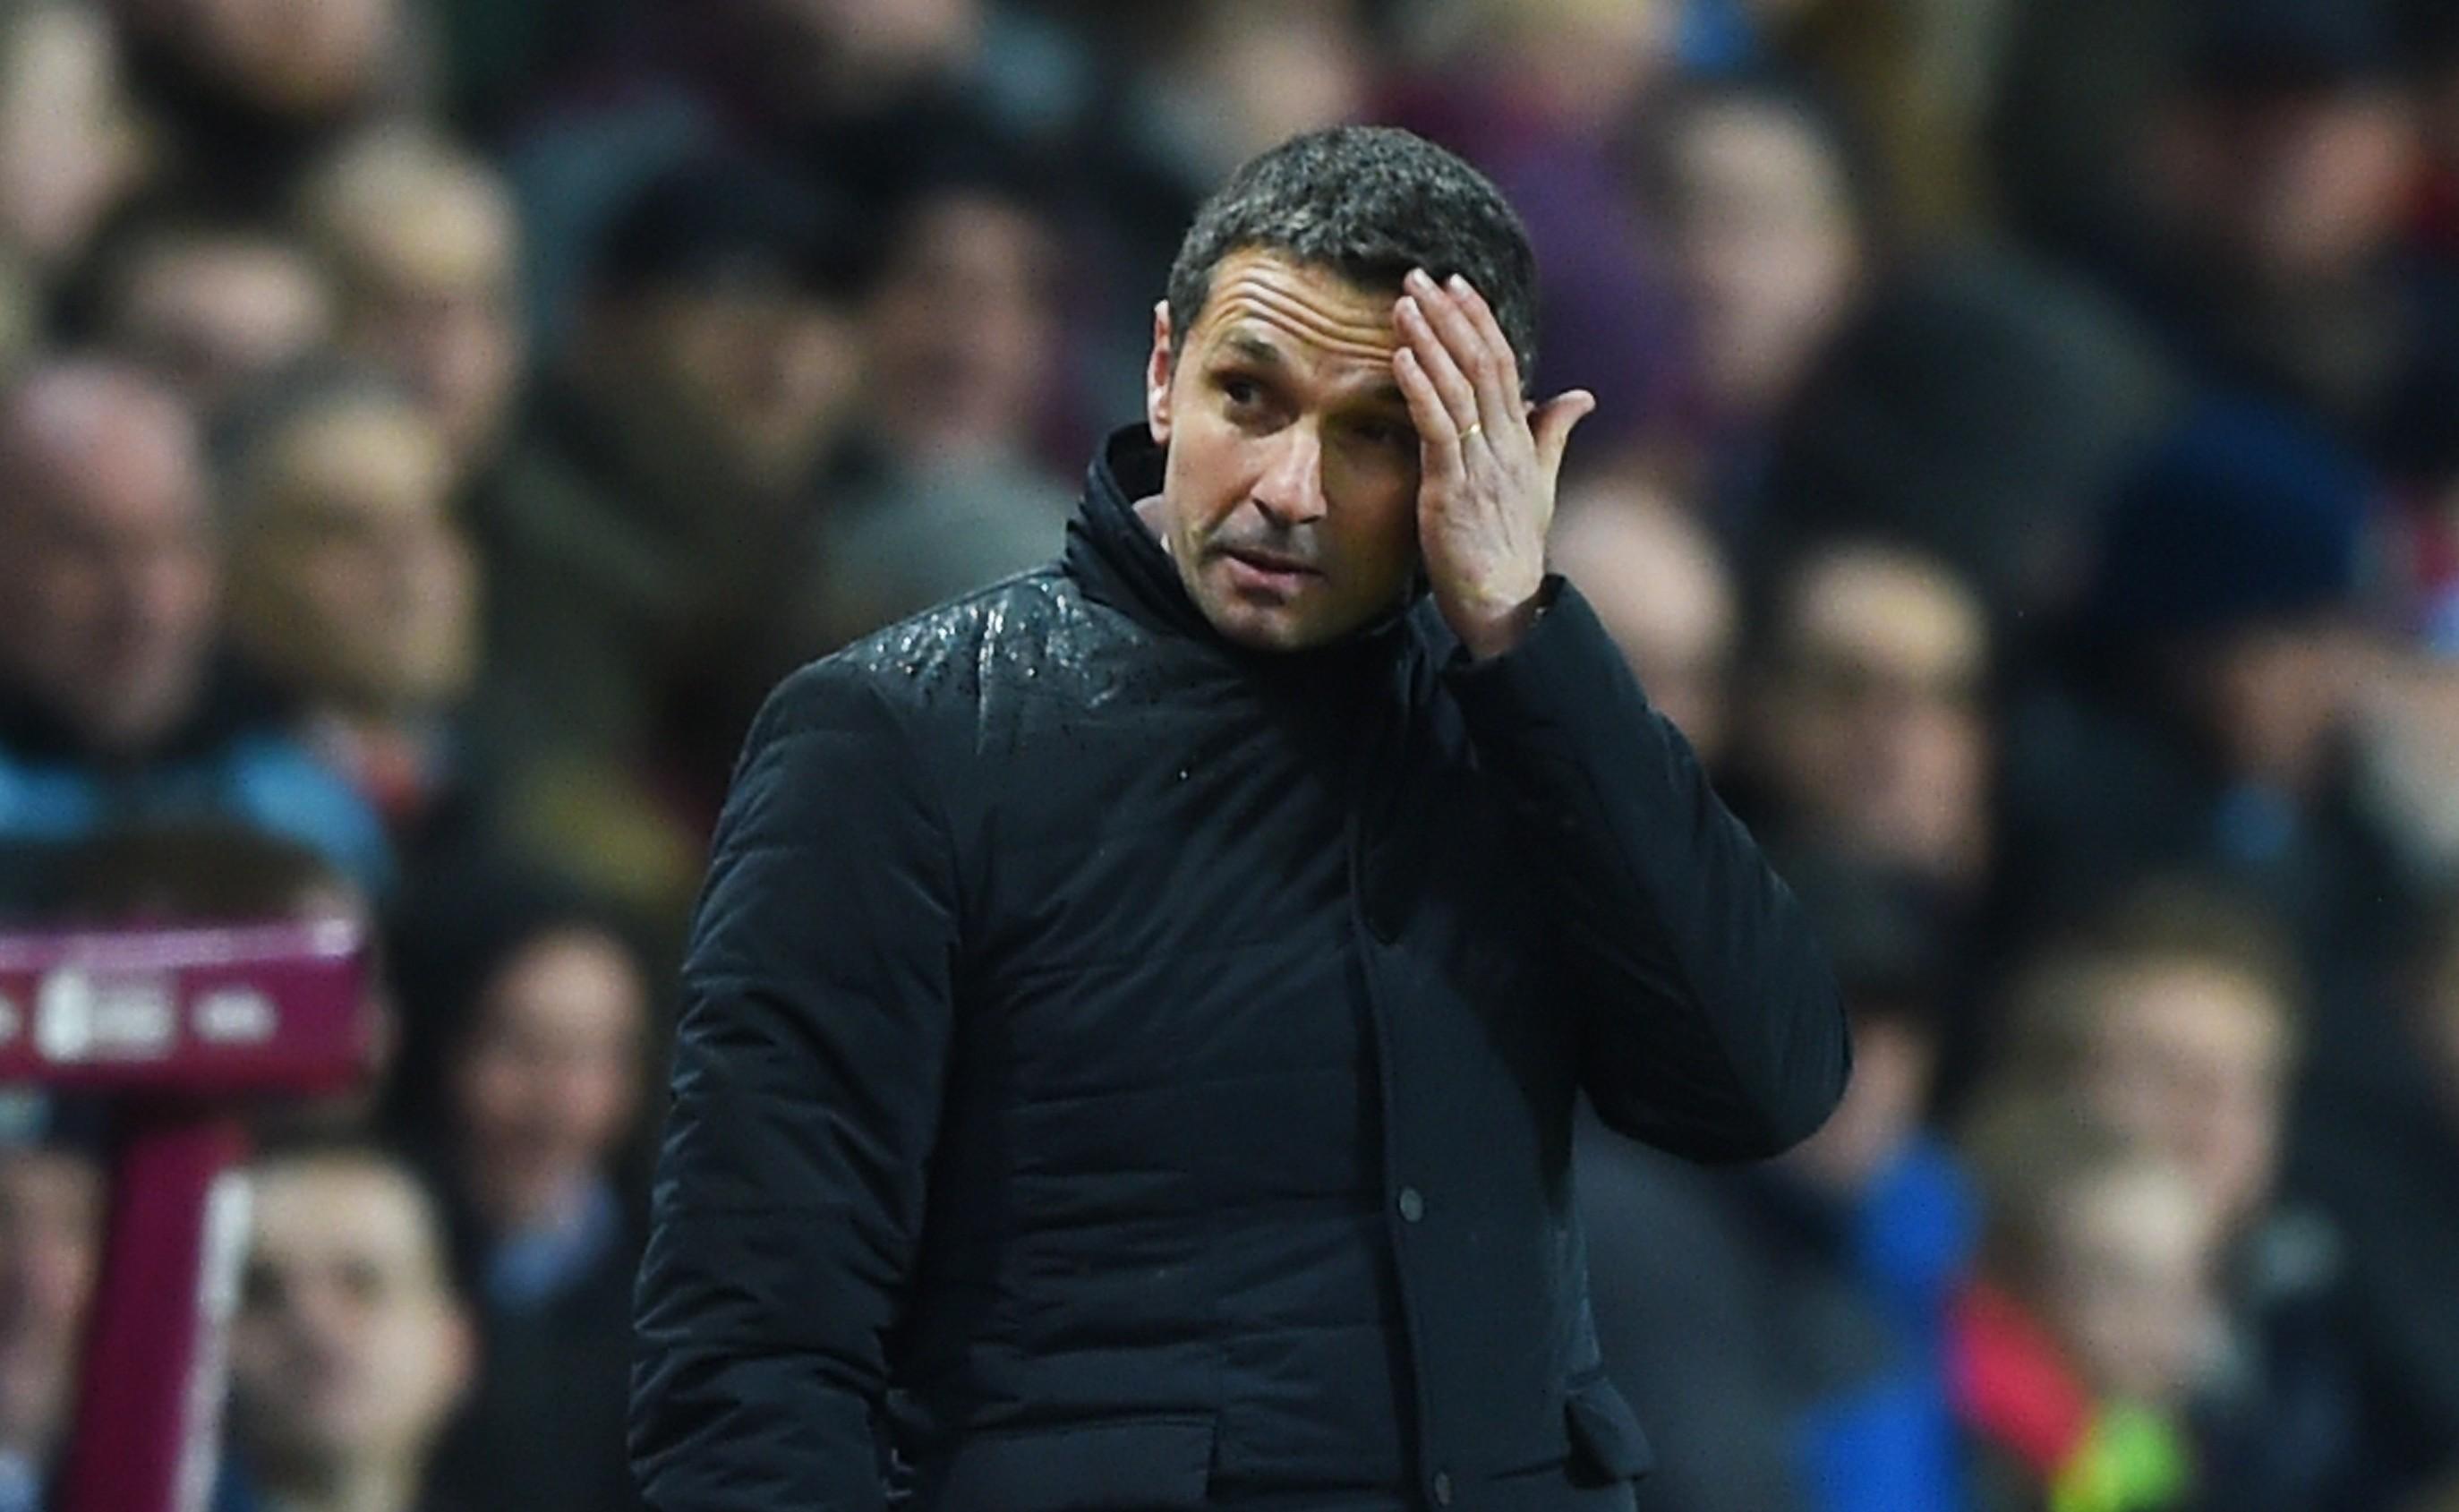 Aston Villa manager Remi Garde (Shaun Botterill/Getty Images)